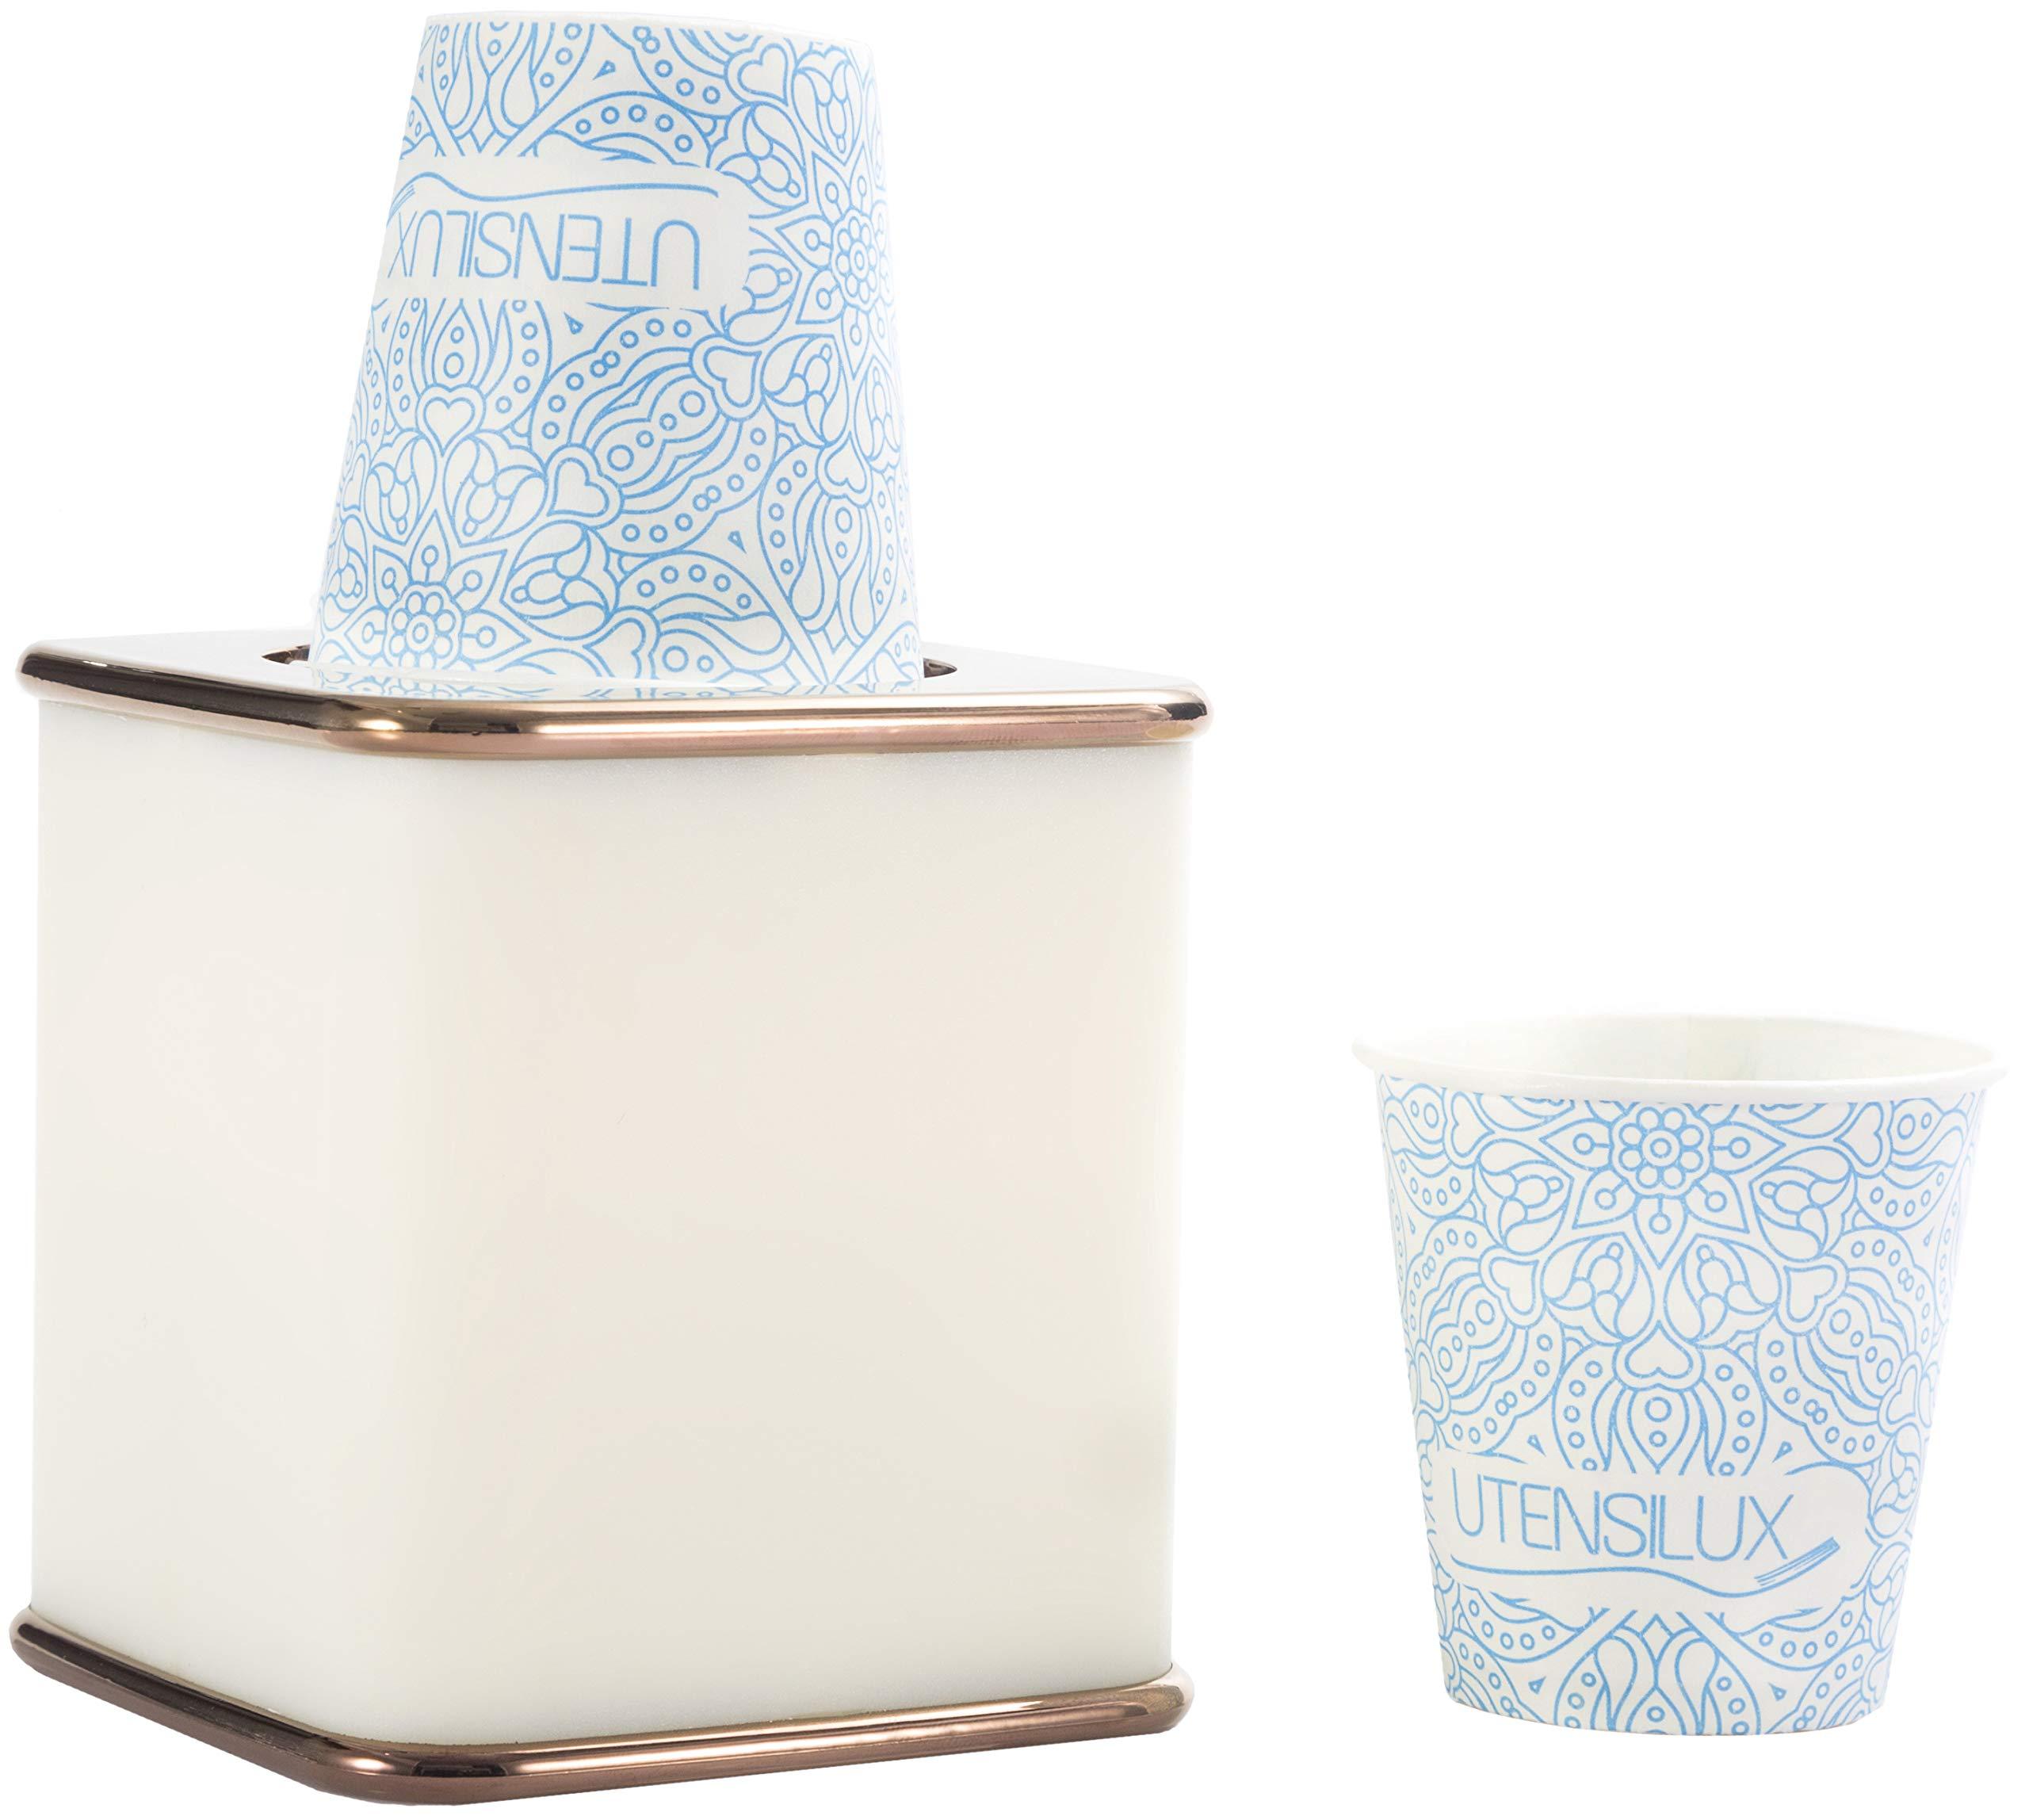 Amazon.com: Utensilux Bathroom Cup Holder, 3 oz and 5 oz ...